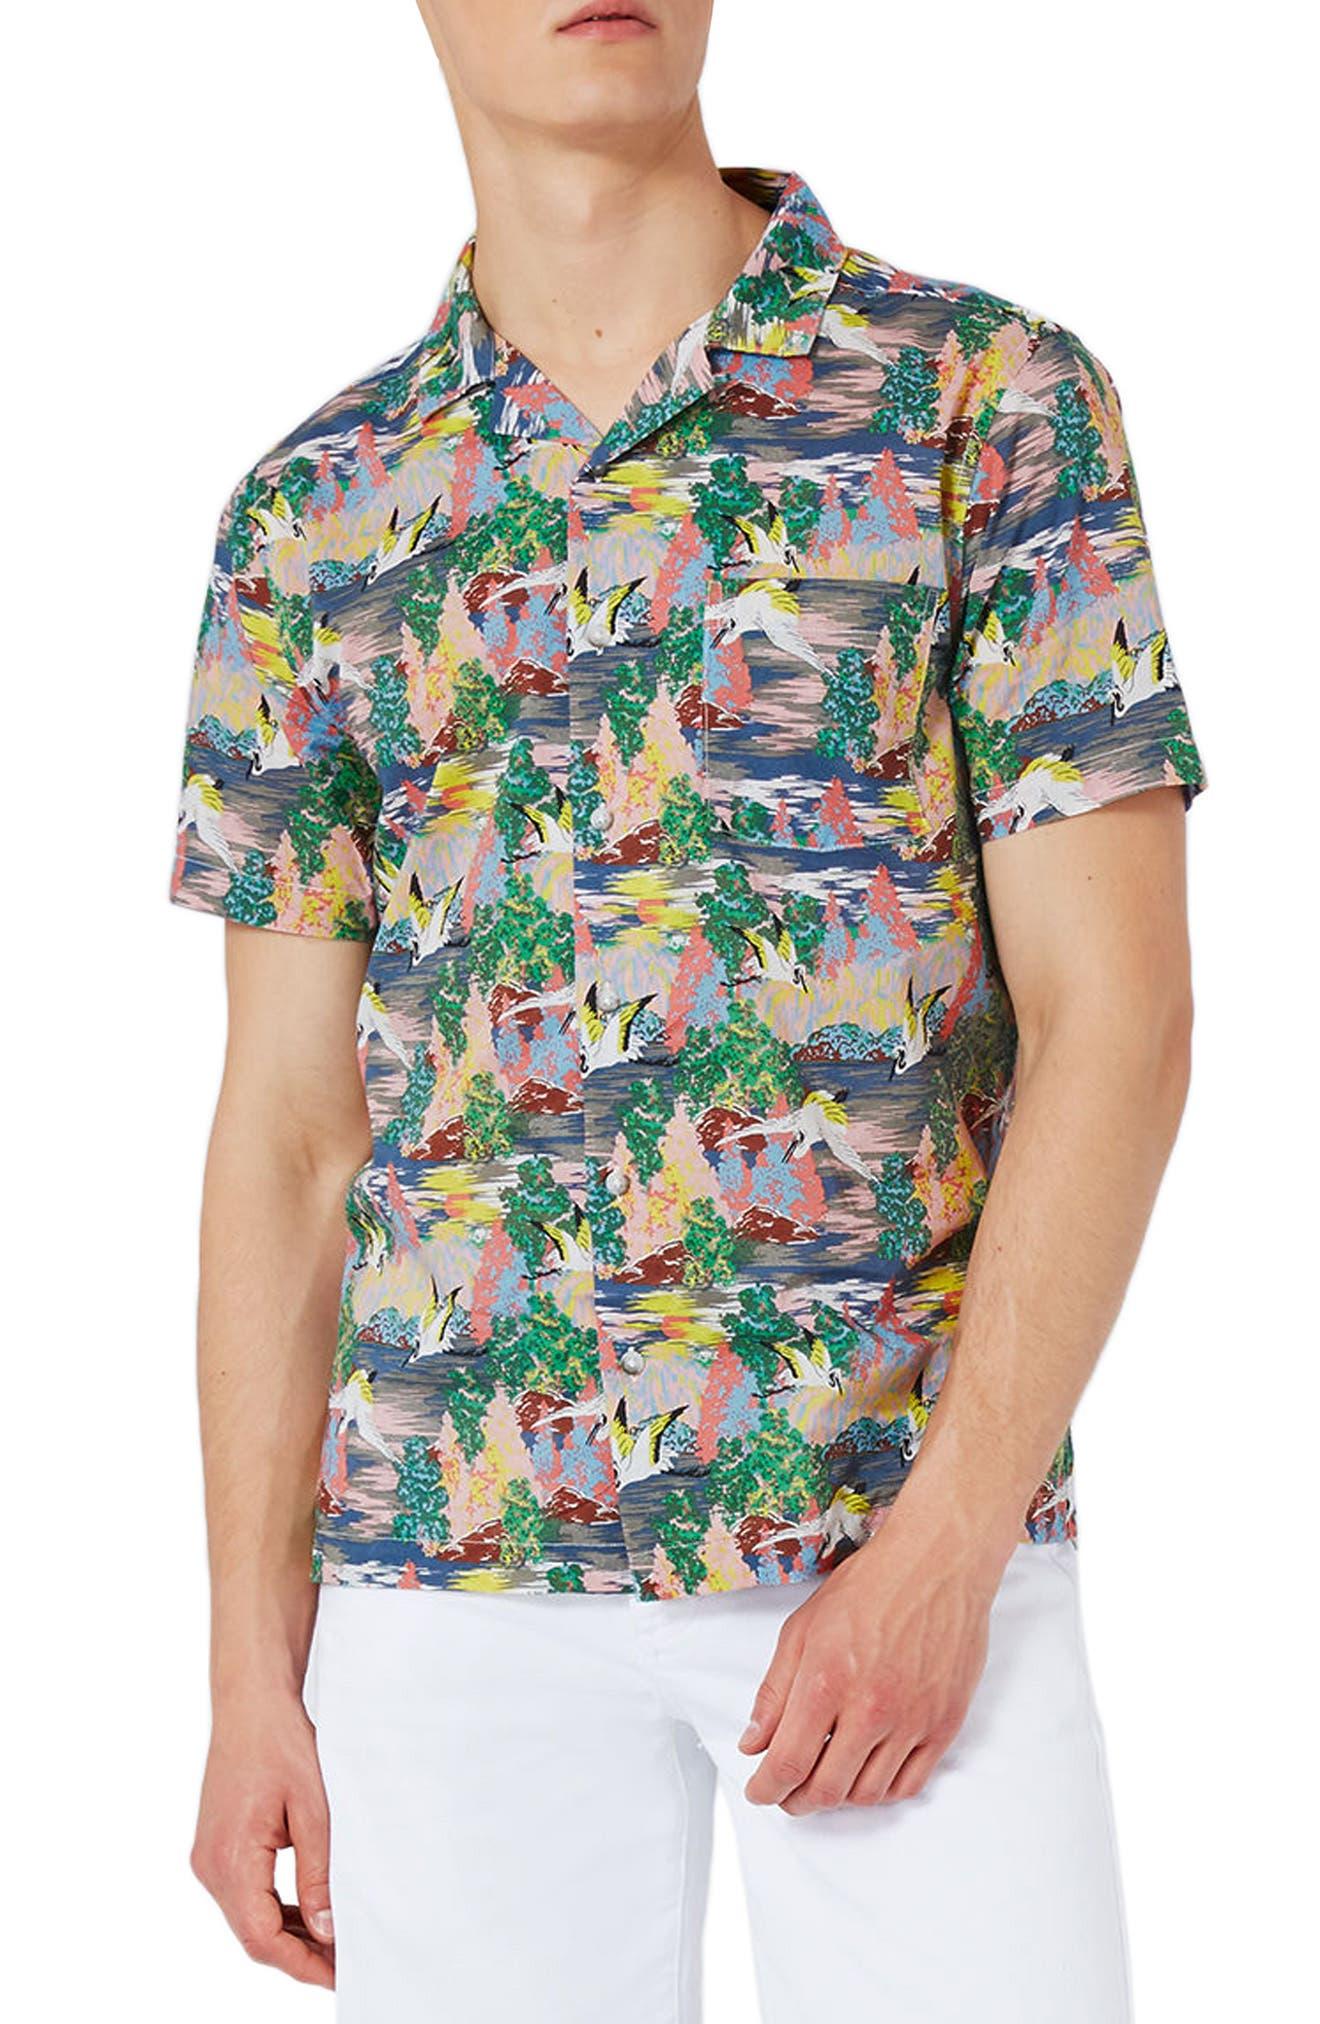 Heron Print Shirt,                         Main,                         color, Blue Multi